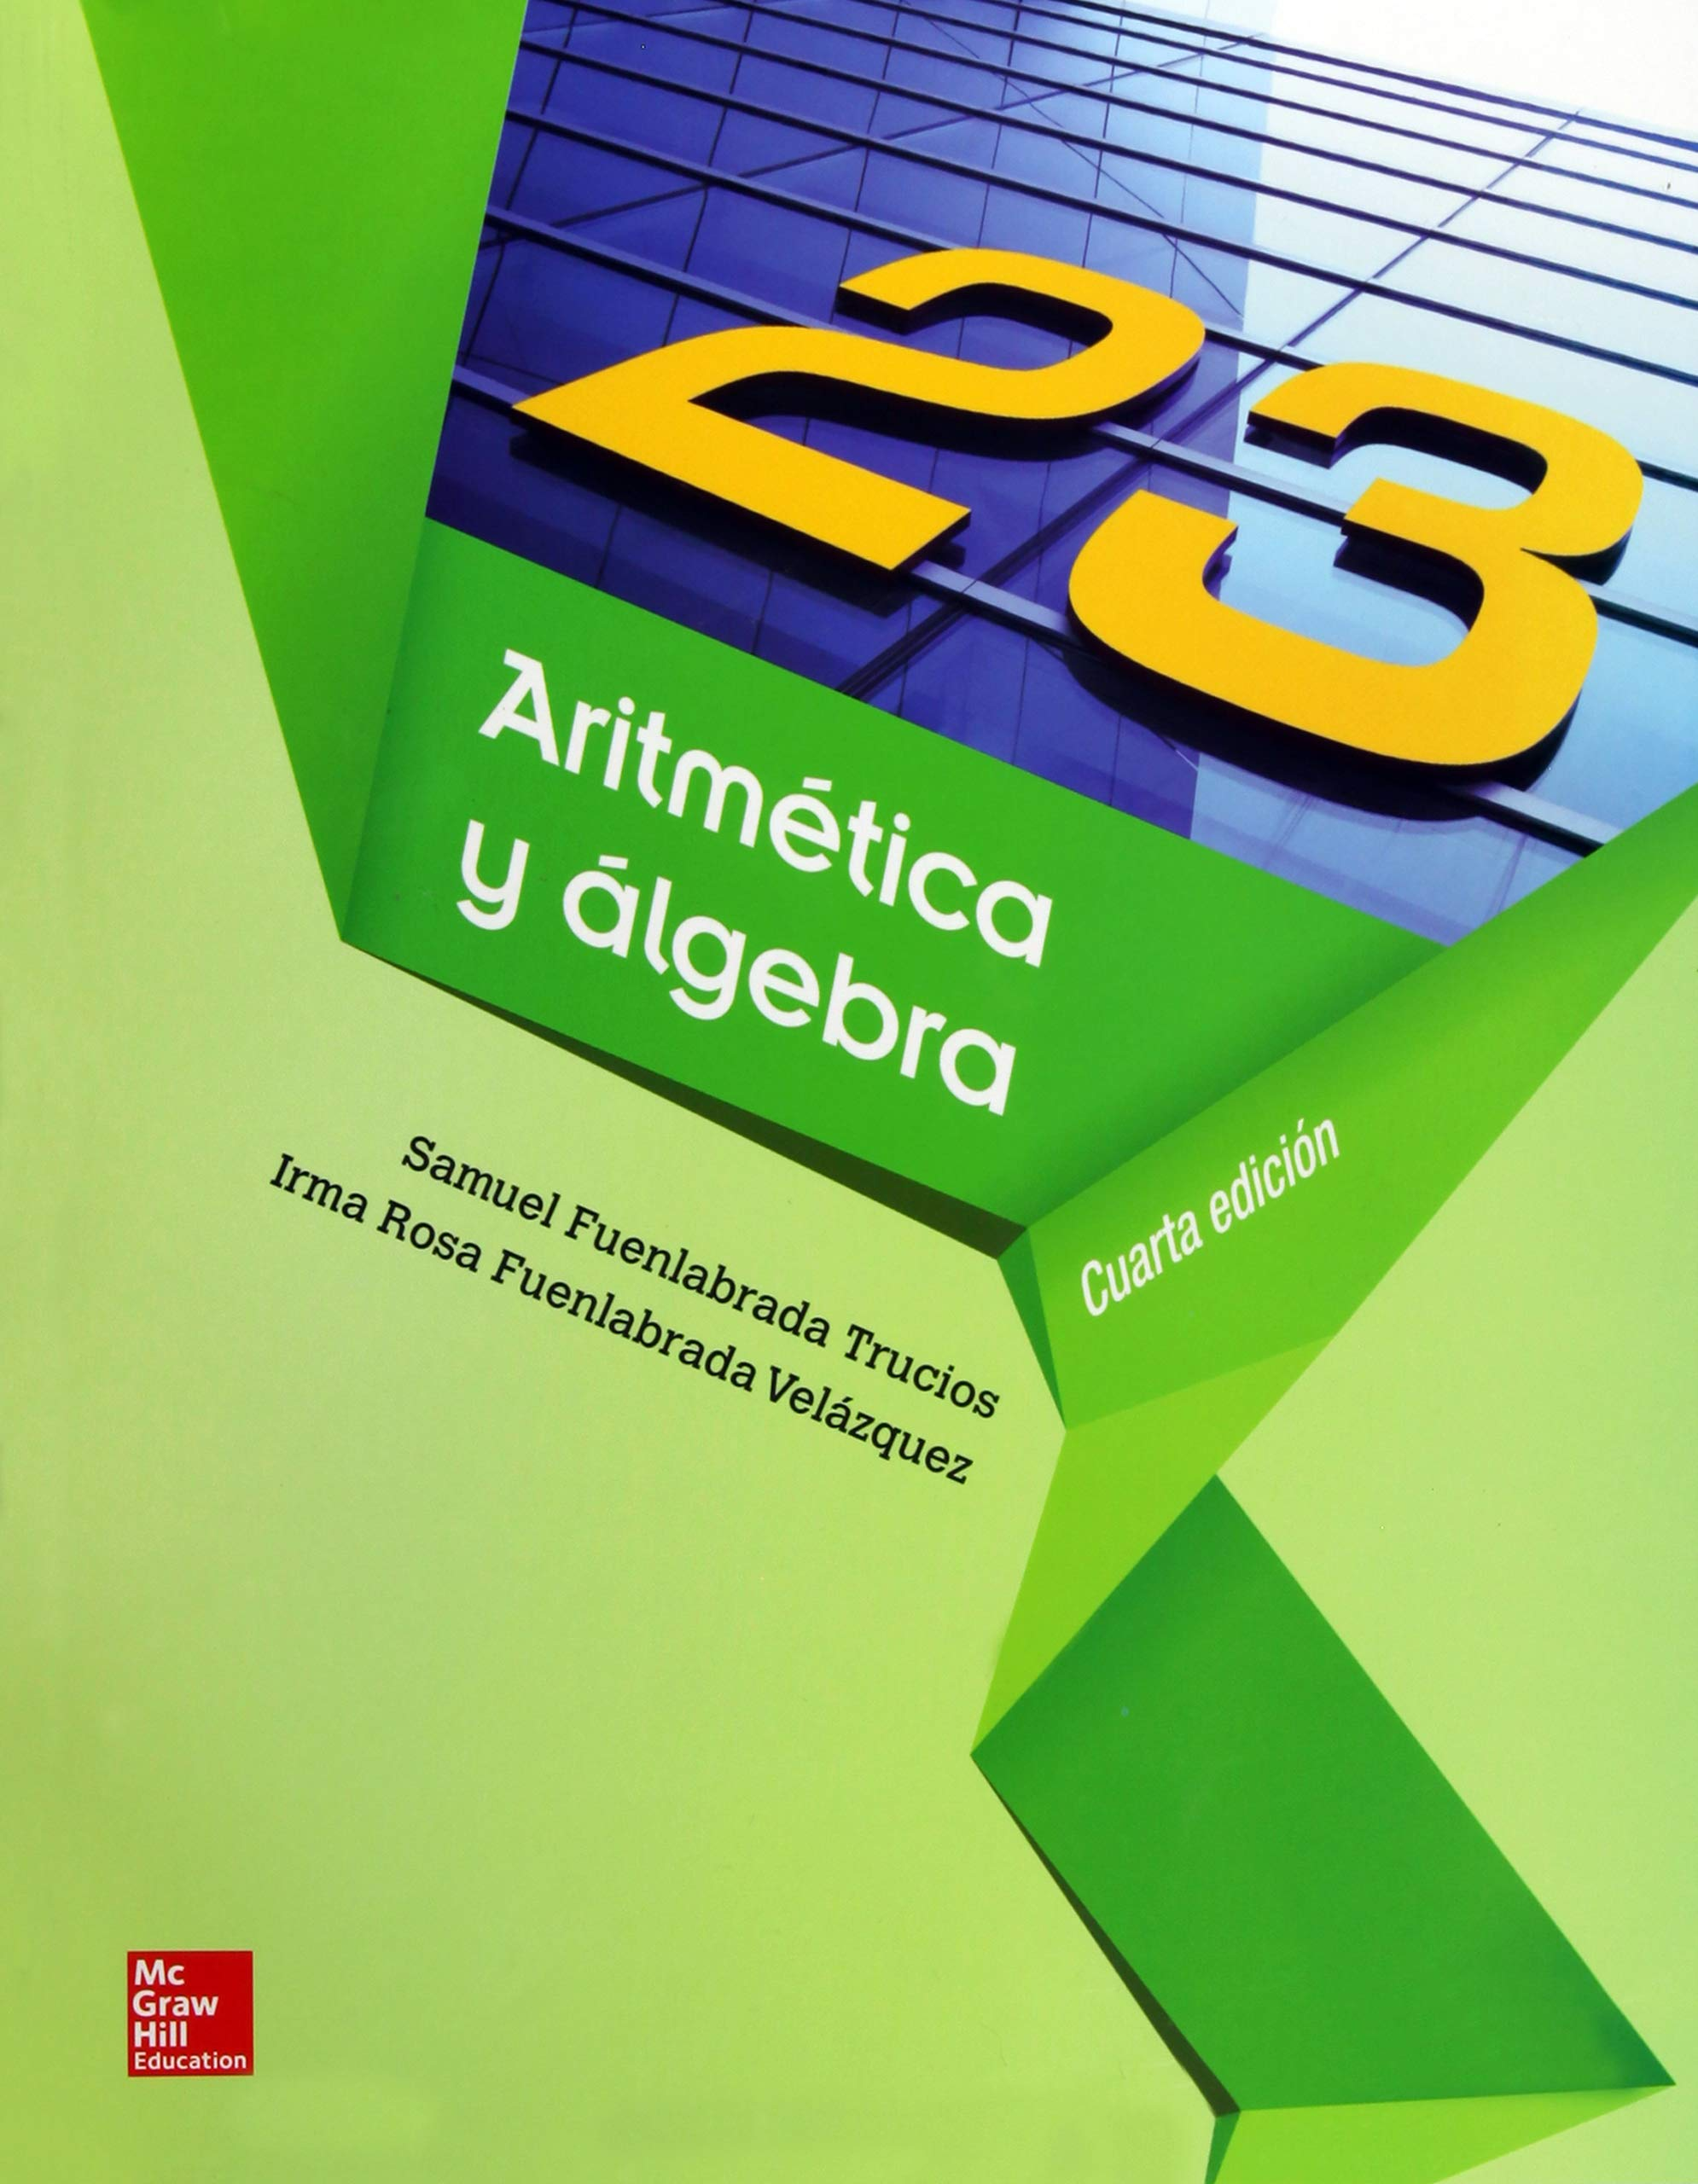 Amazon.com: ARITMETICA Y ALGEBRA (9786071508959): SAMUEL ...